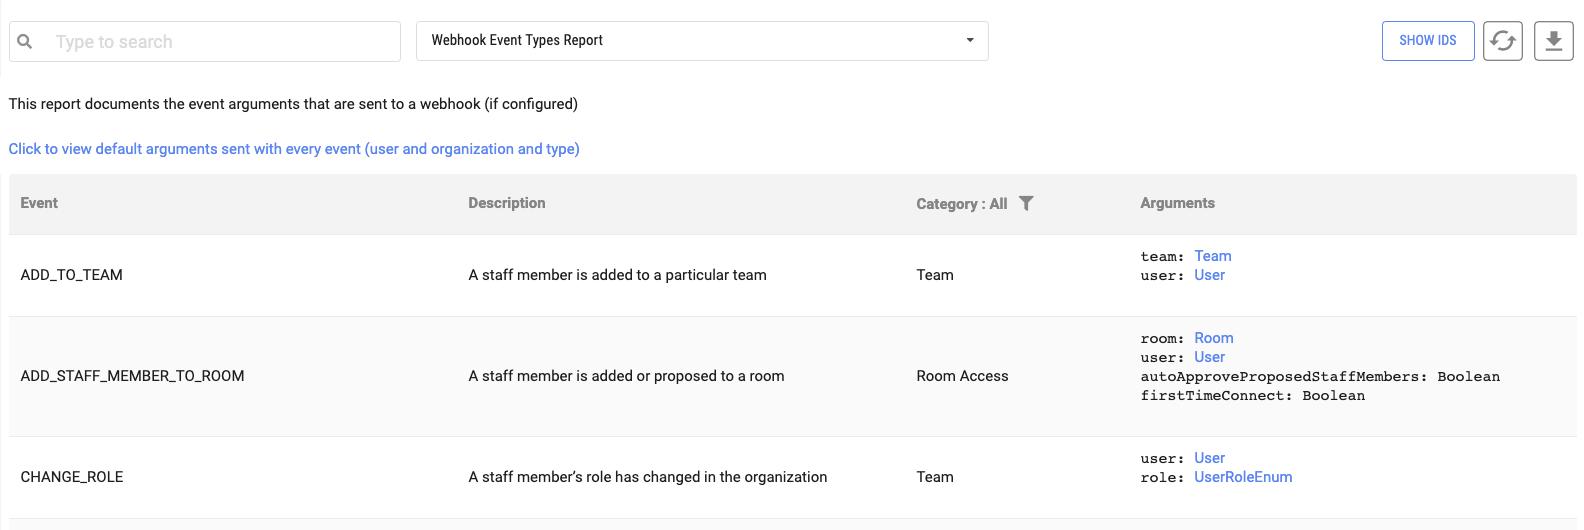 Tehama Reports Webhooks Event Types